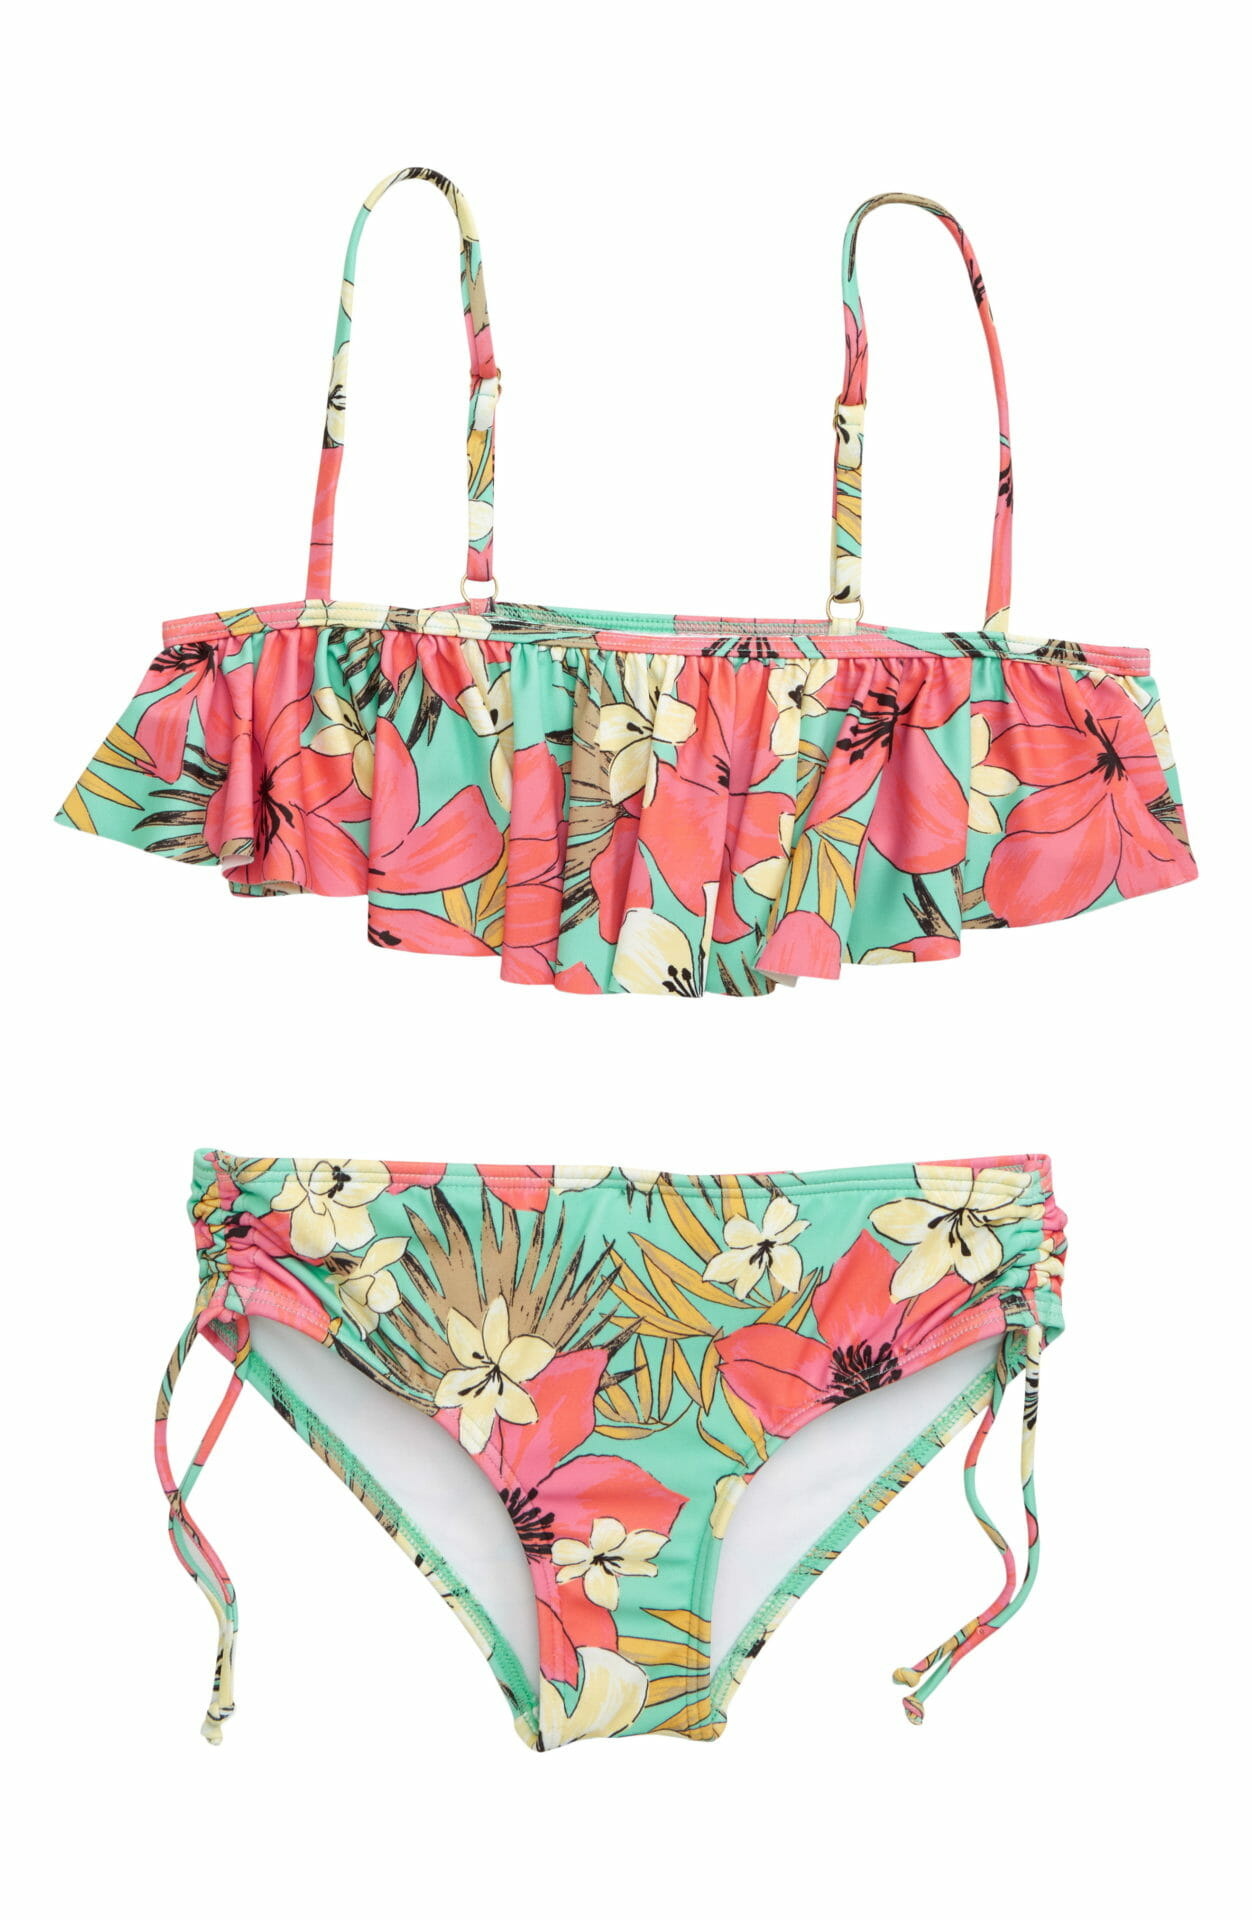 BILLABONG Aloha Sun Flutter Two-Piece Swimsuit, Main, color, MO-MINT